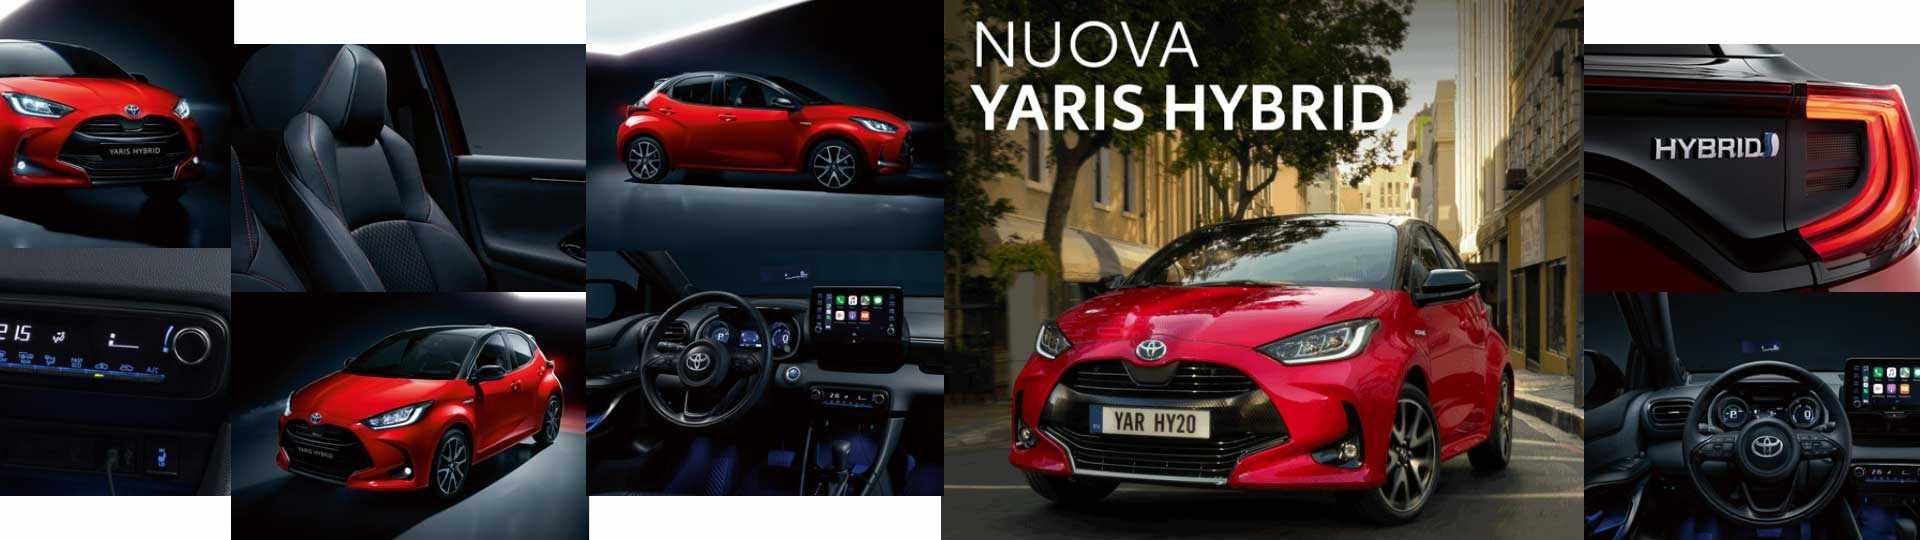 Nuova-Yaris-Hybrid-min.jpg